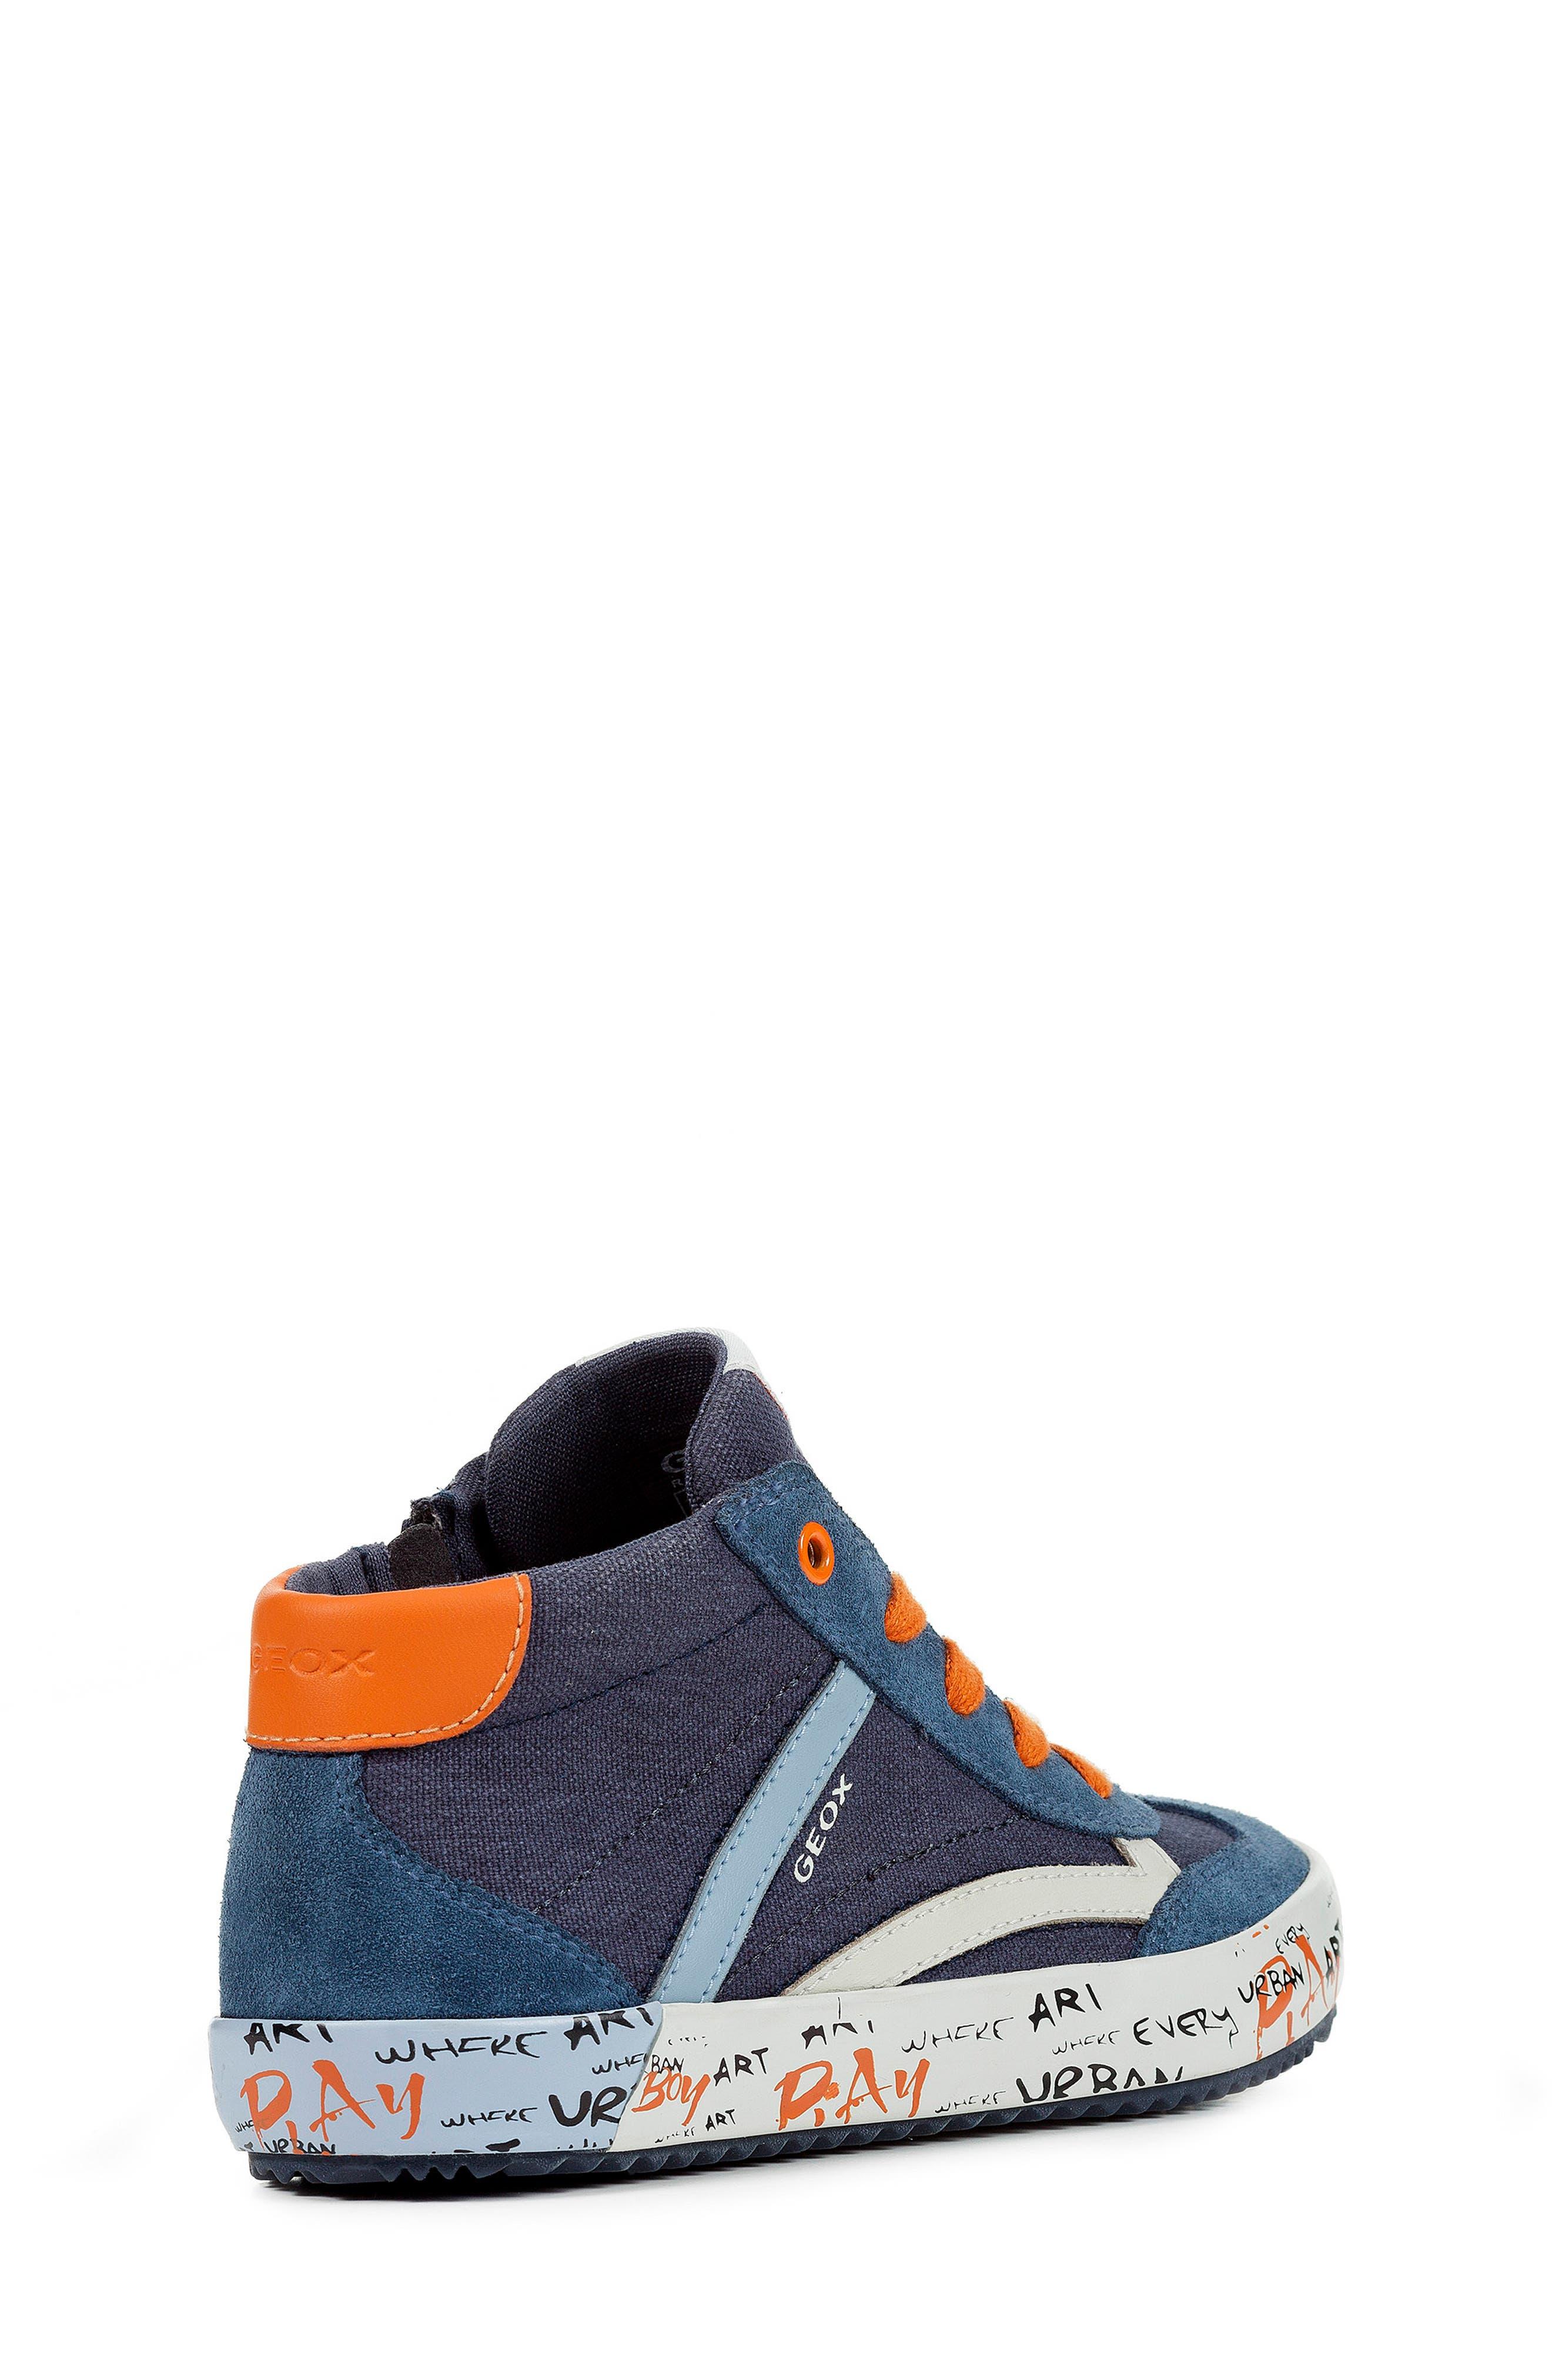 Alonisso 34 High Top Sneaker,                             Alternate thumbnail 7, color,                             NAVY/ DARK ORANGE